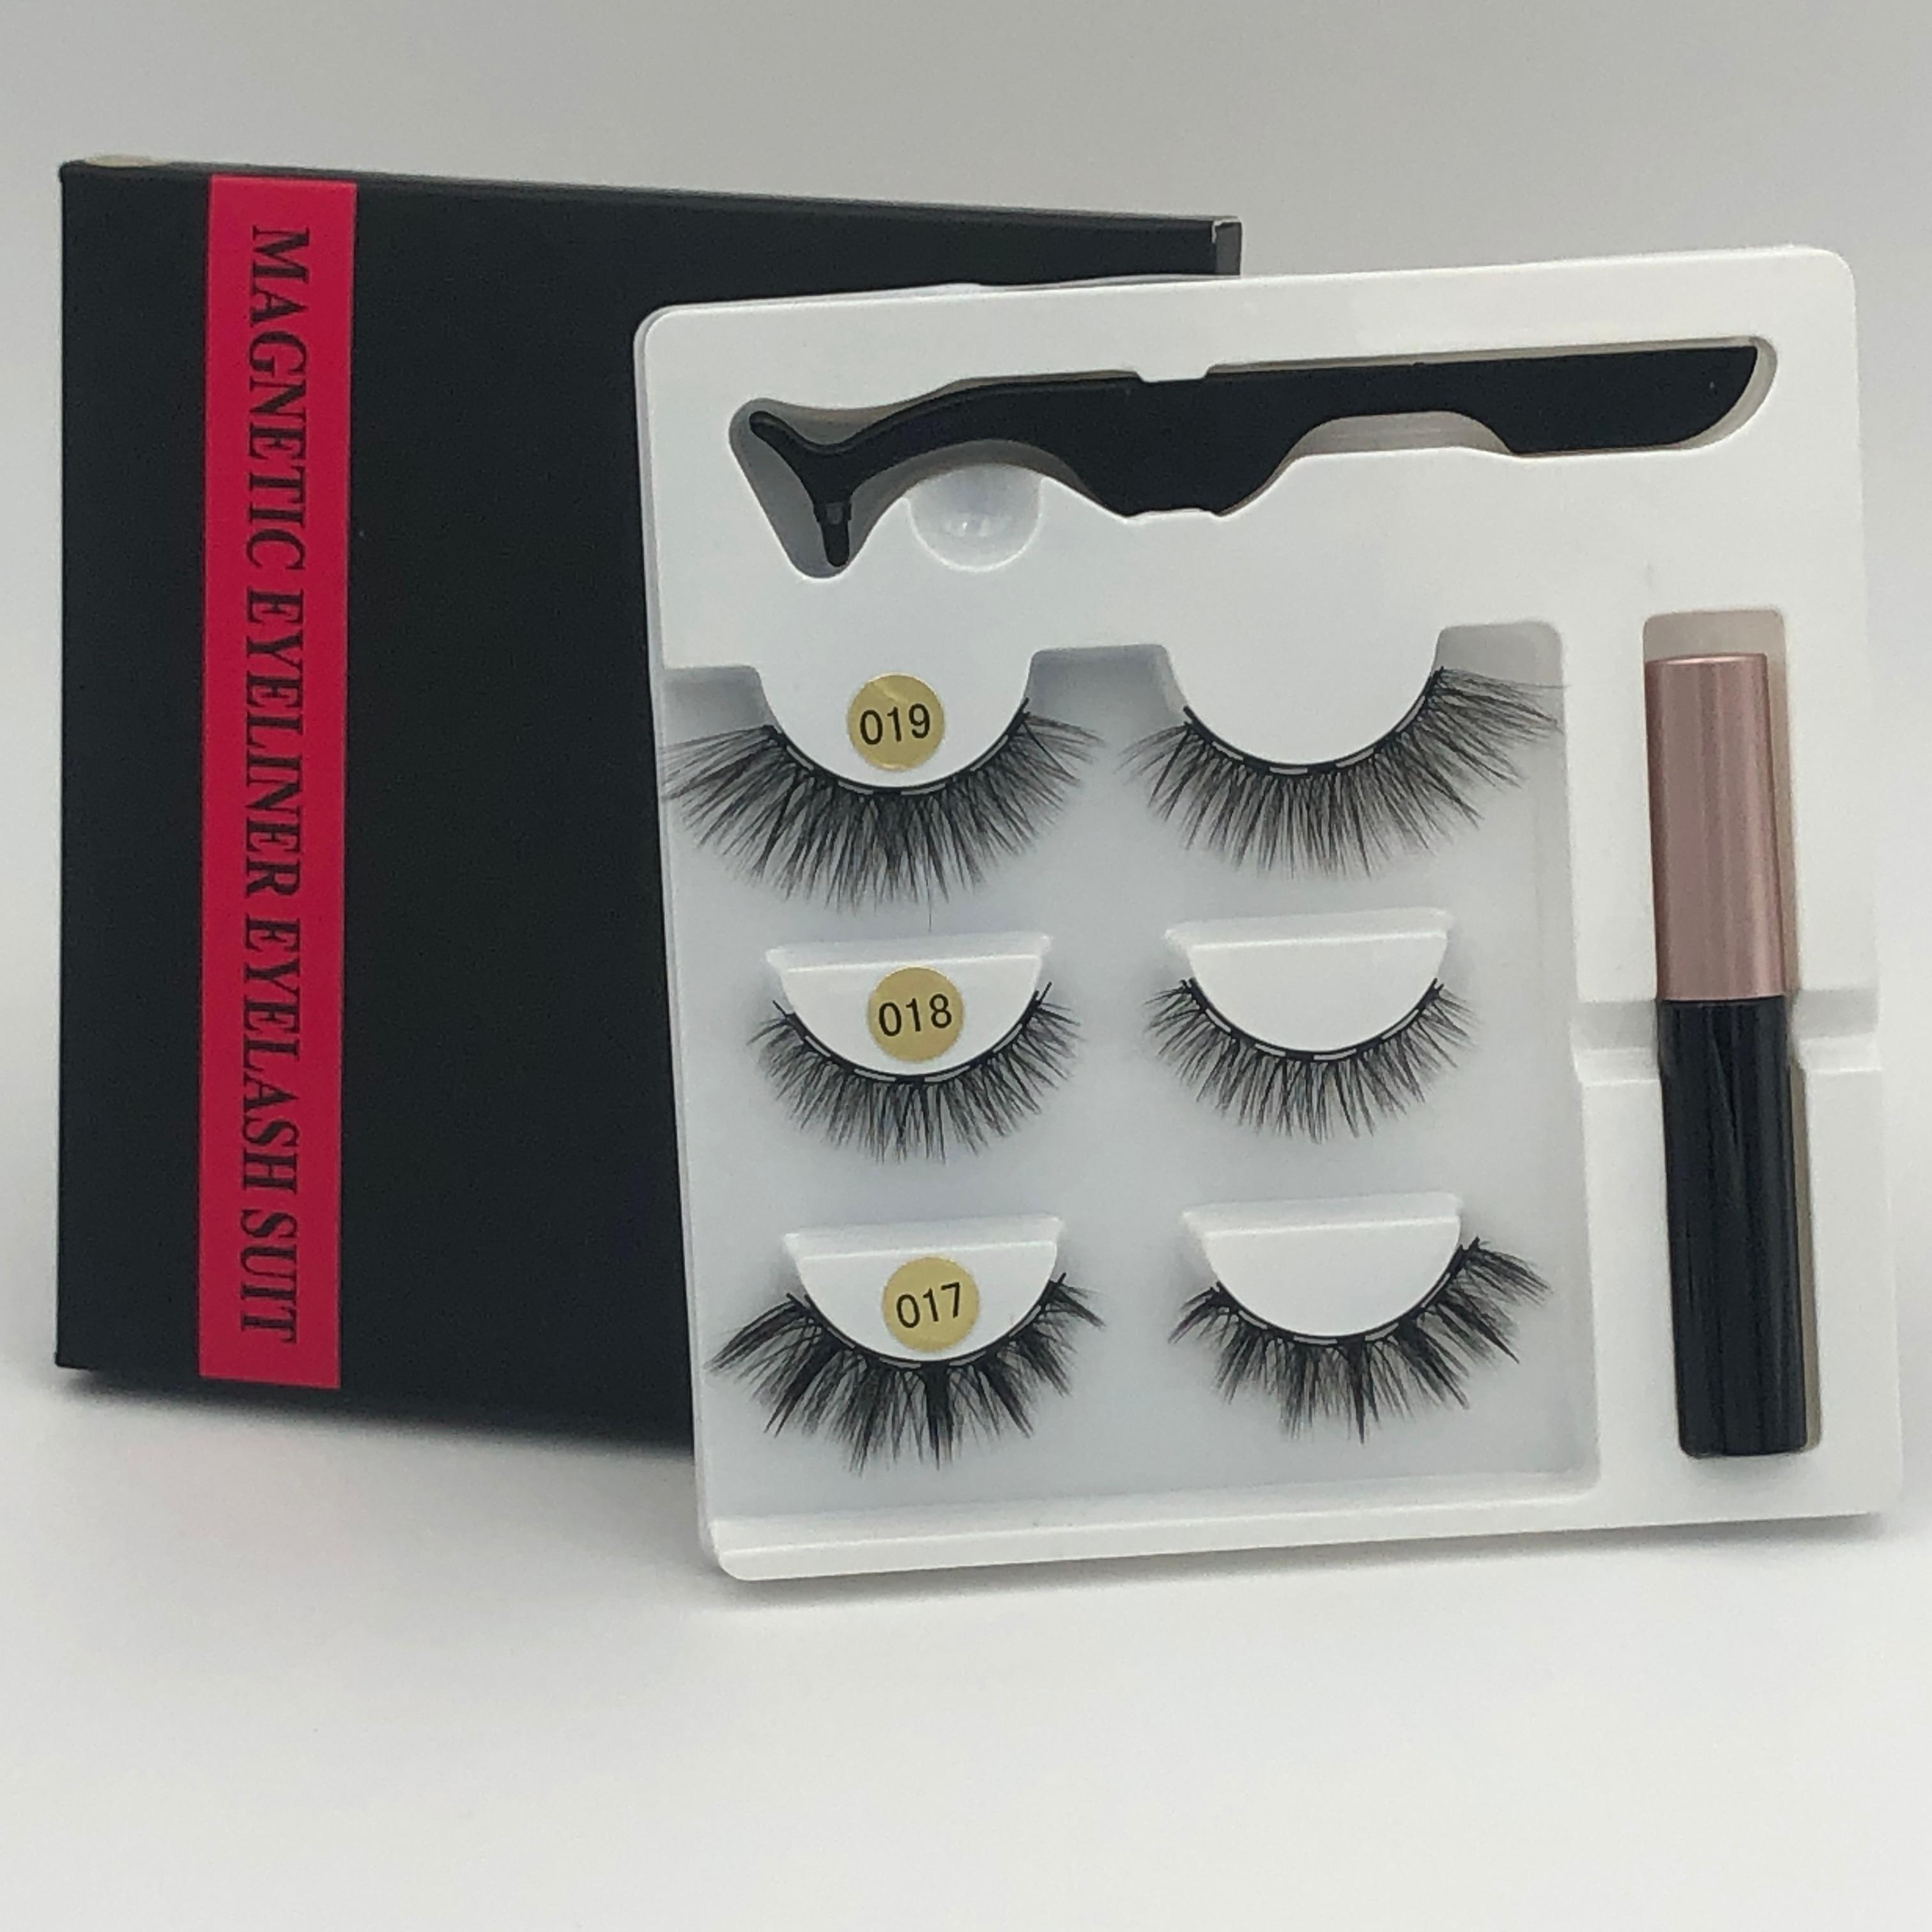 Makeup 3 Pairs Of Magnetic Eyelashes Magnetic Eyeliner Tweezers, Waterproof Long Lasting Natural Eyelashes Set Gift Box Eyelash